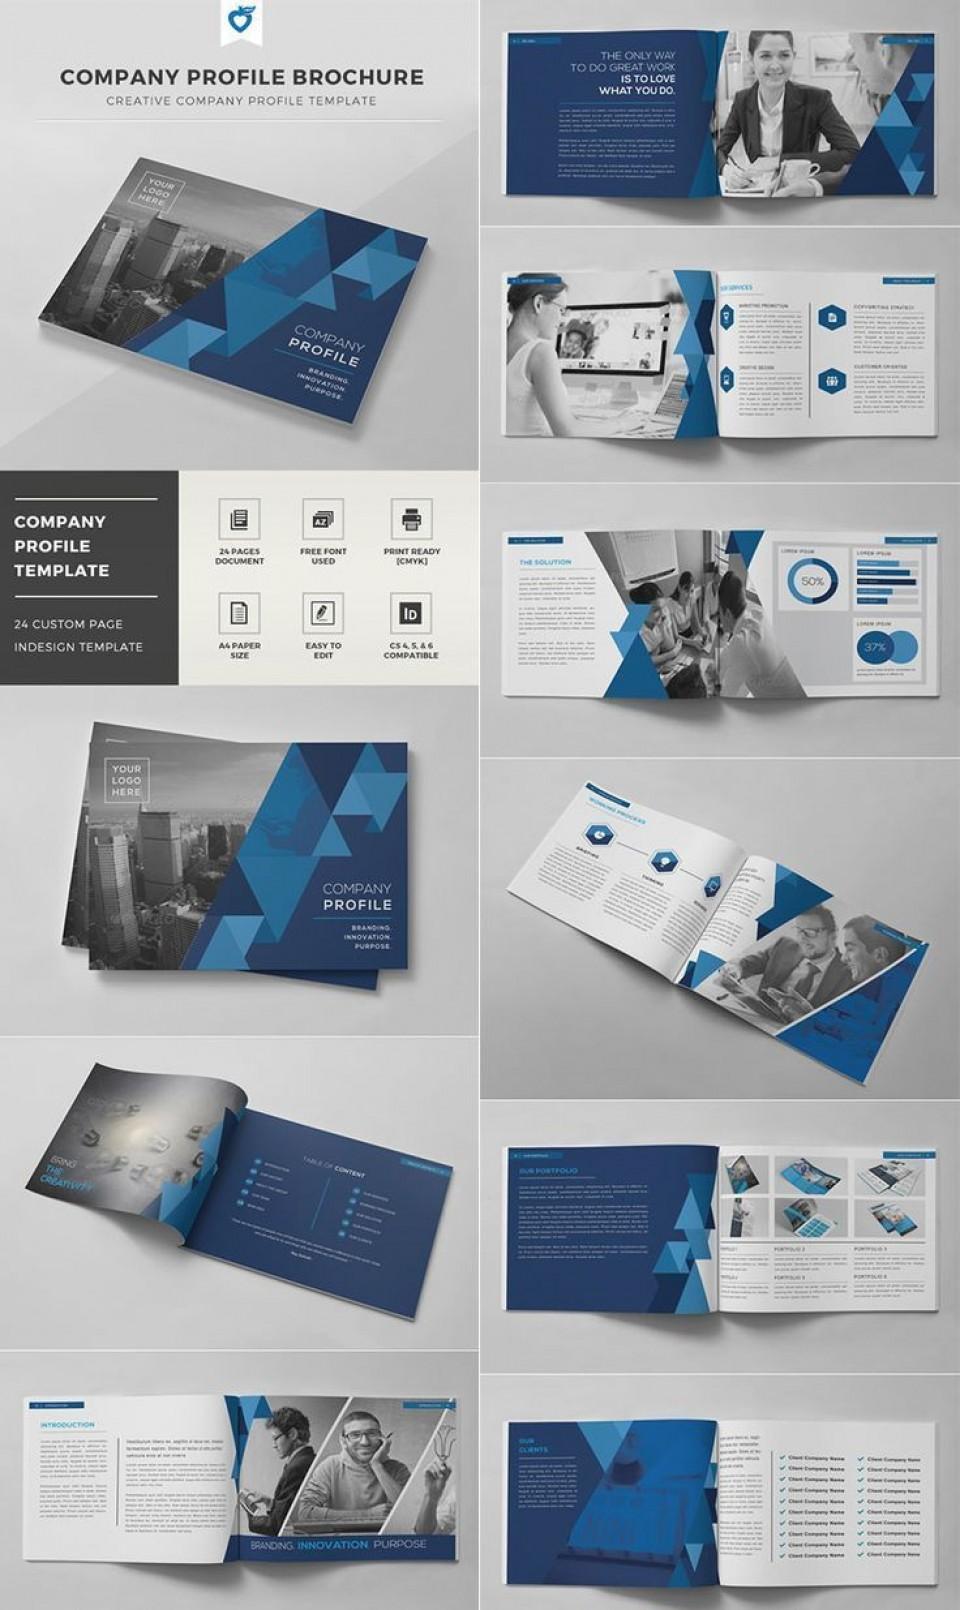 003 Astounding Busines Brochure Design Template Free Download Inspiration 960